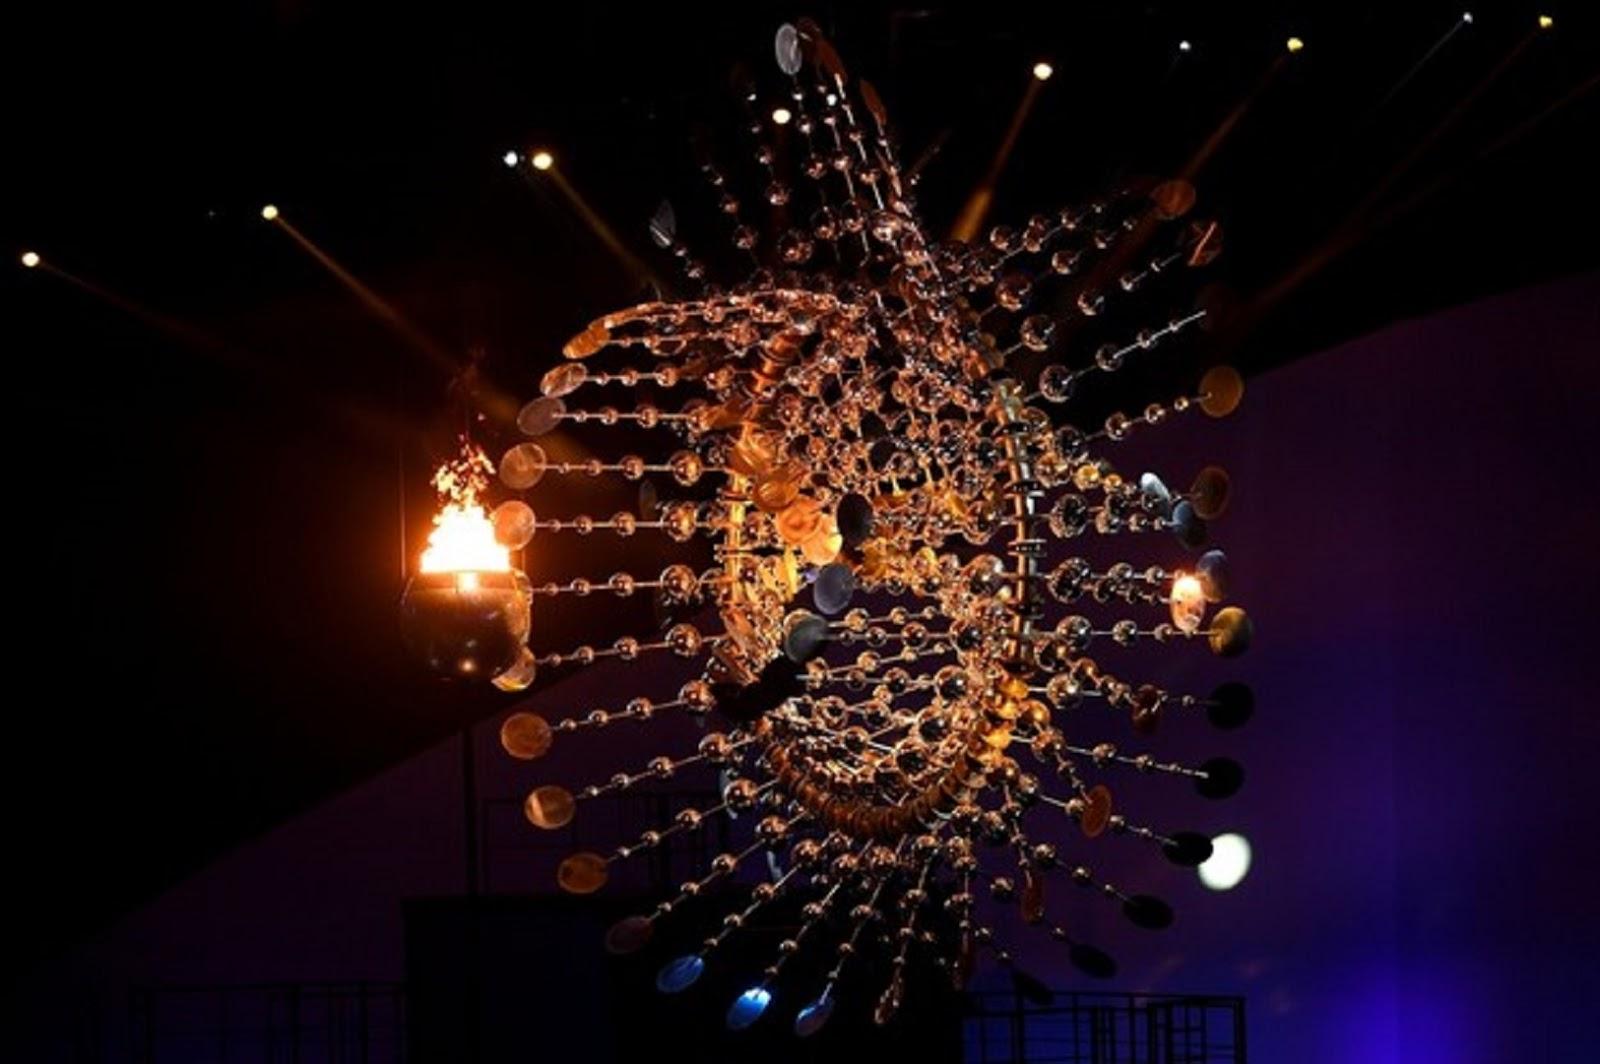 RIO OLYMPICS OPENING CEREMONY 2